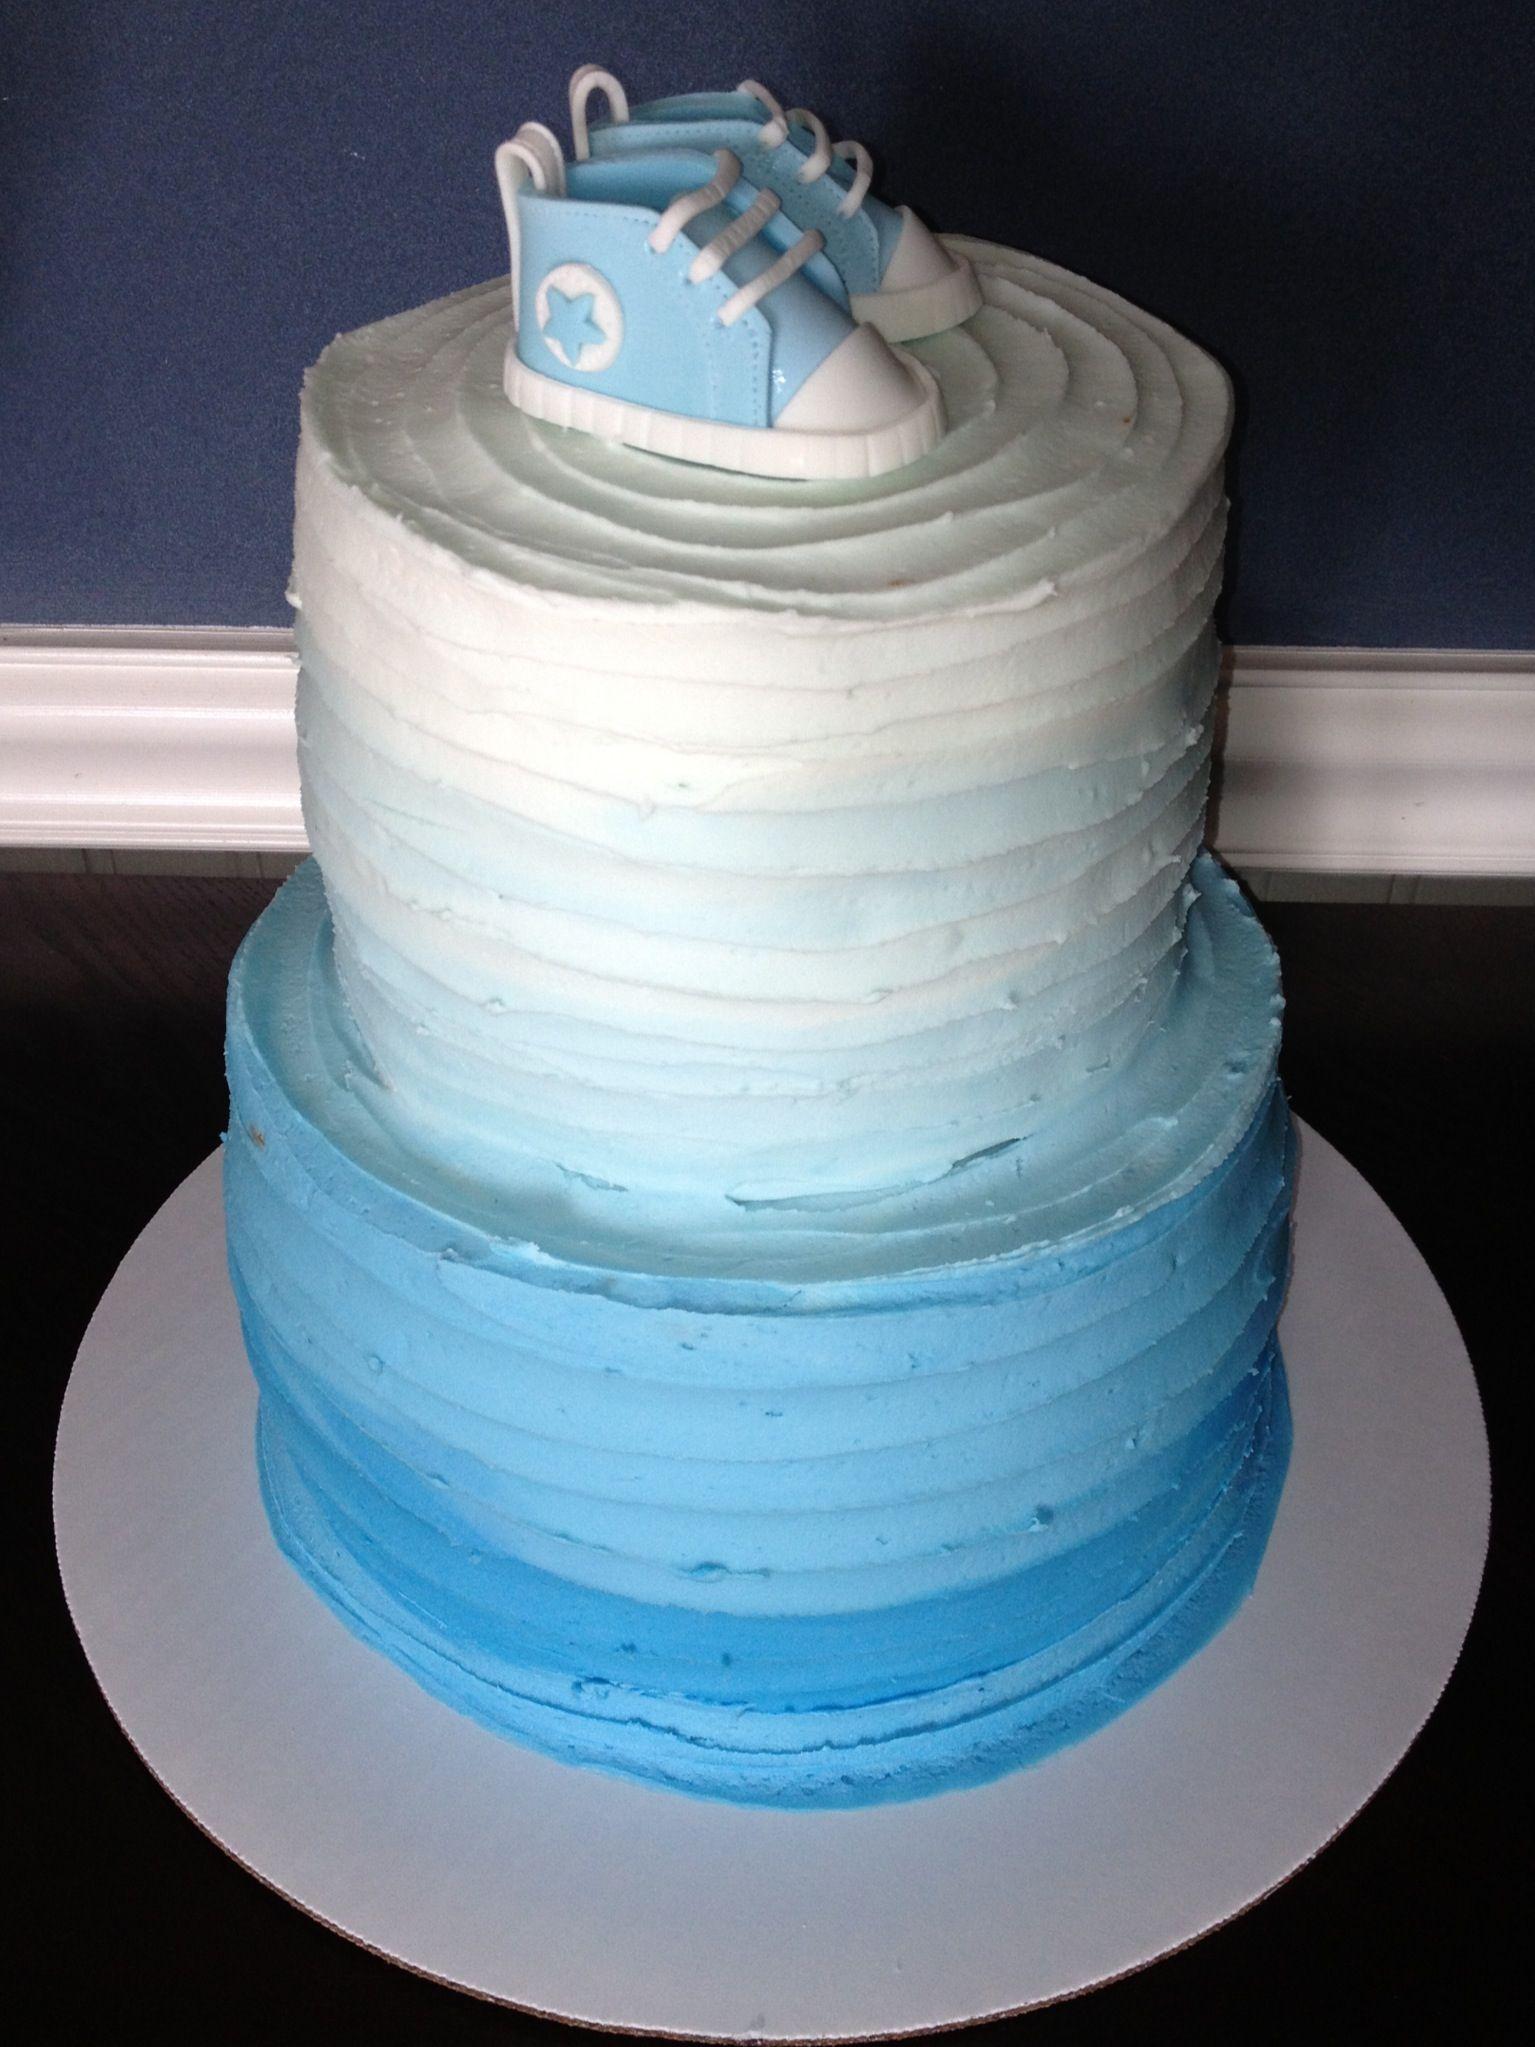 7490be4cf584 Baby converse ombré cake